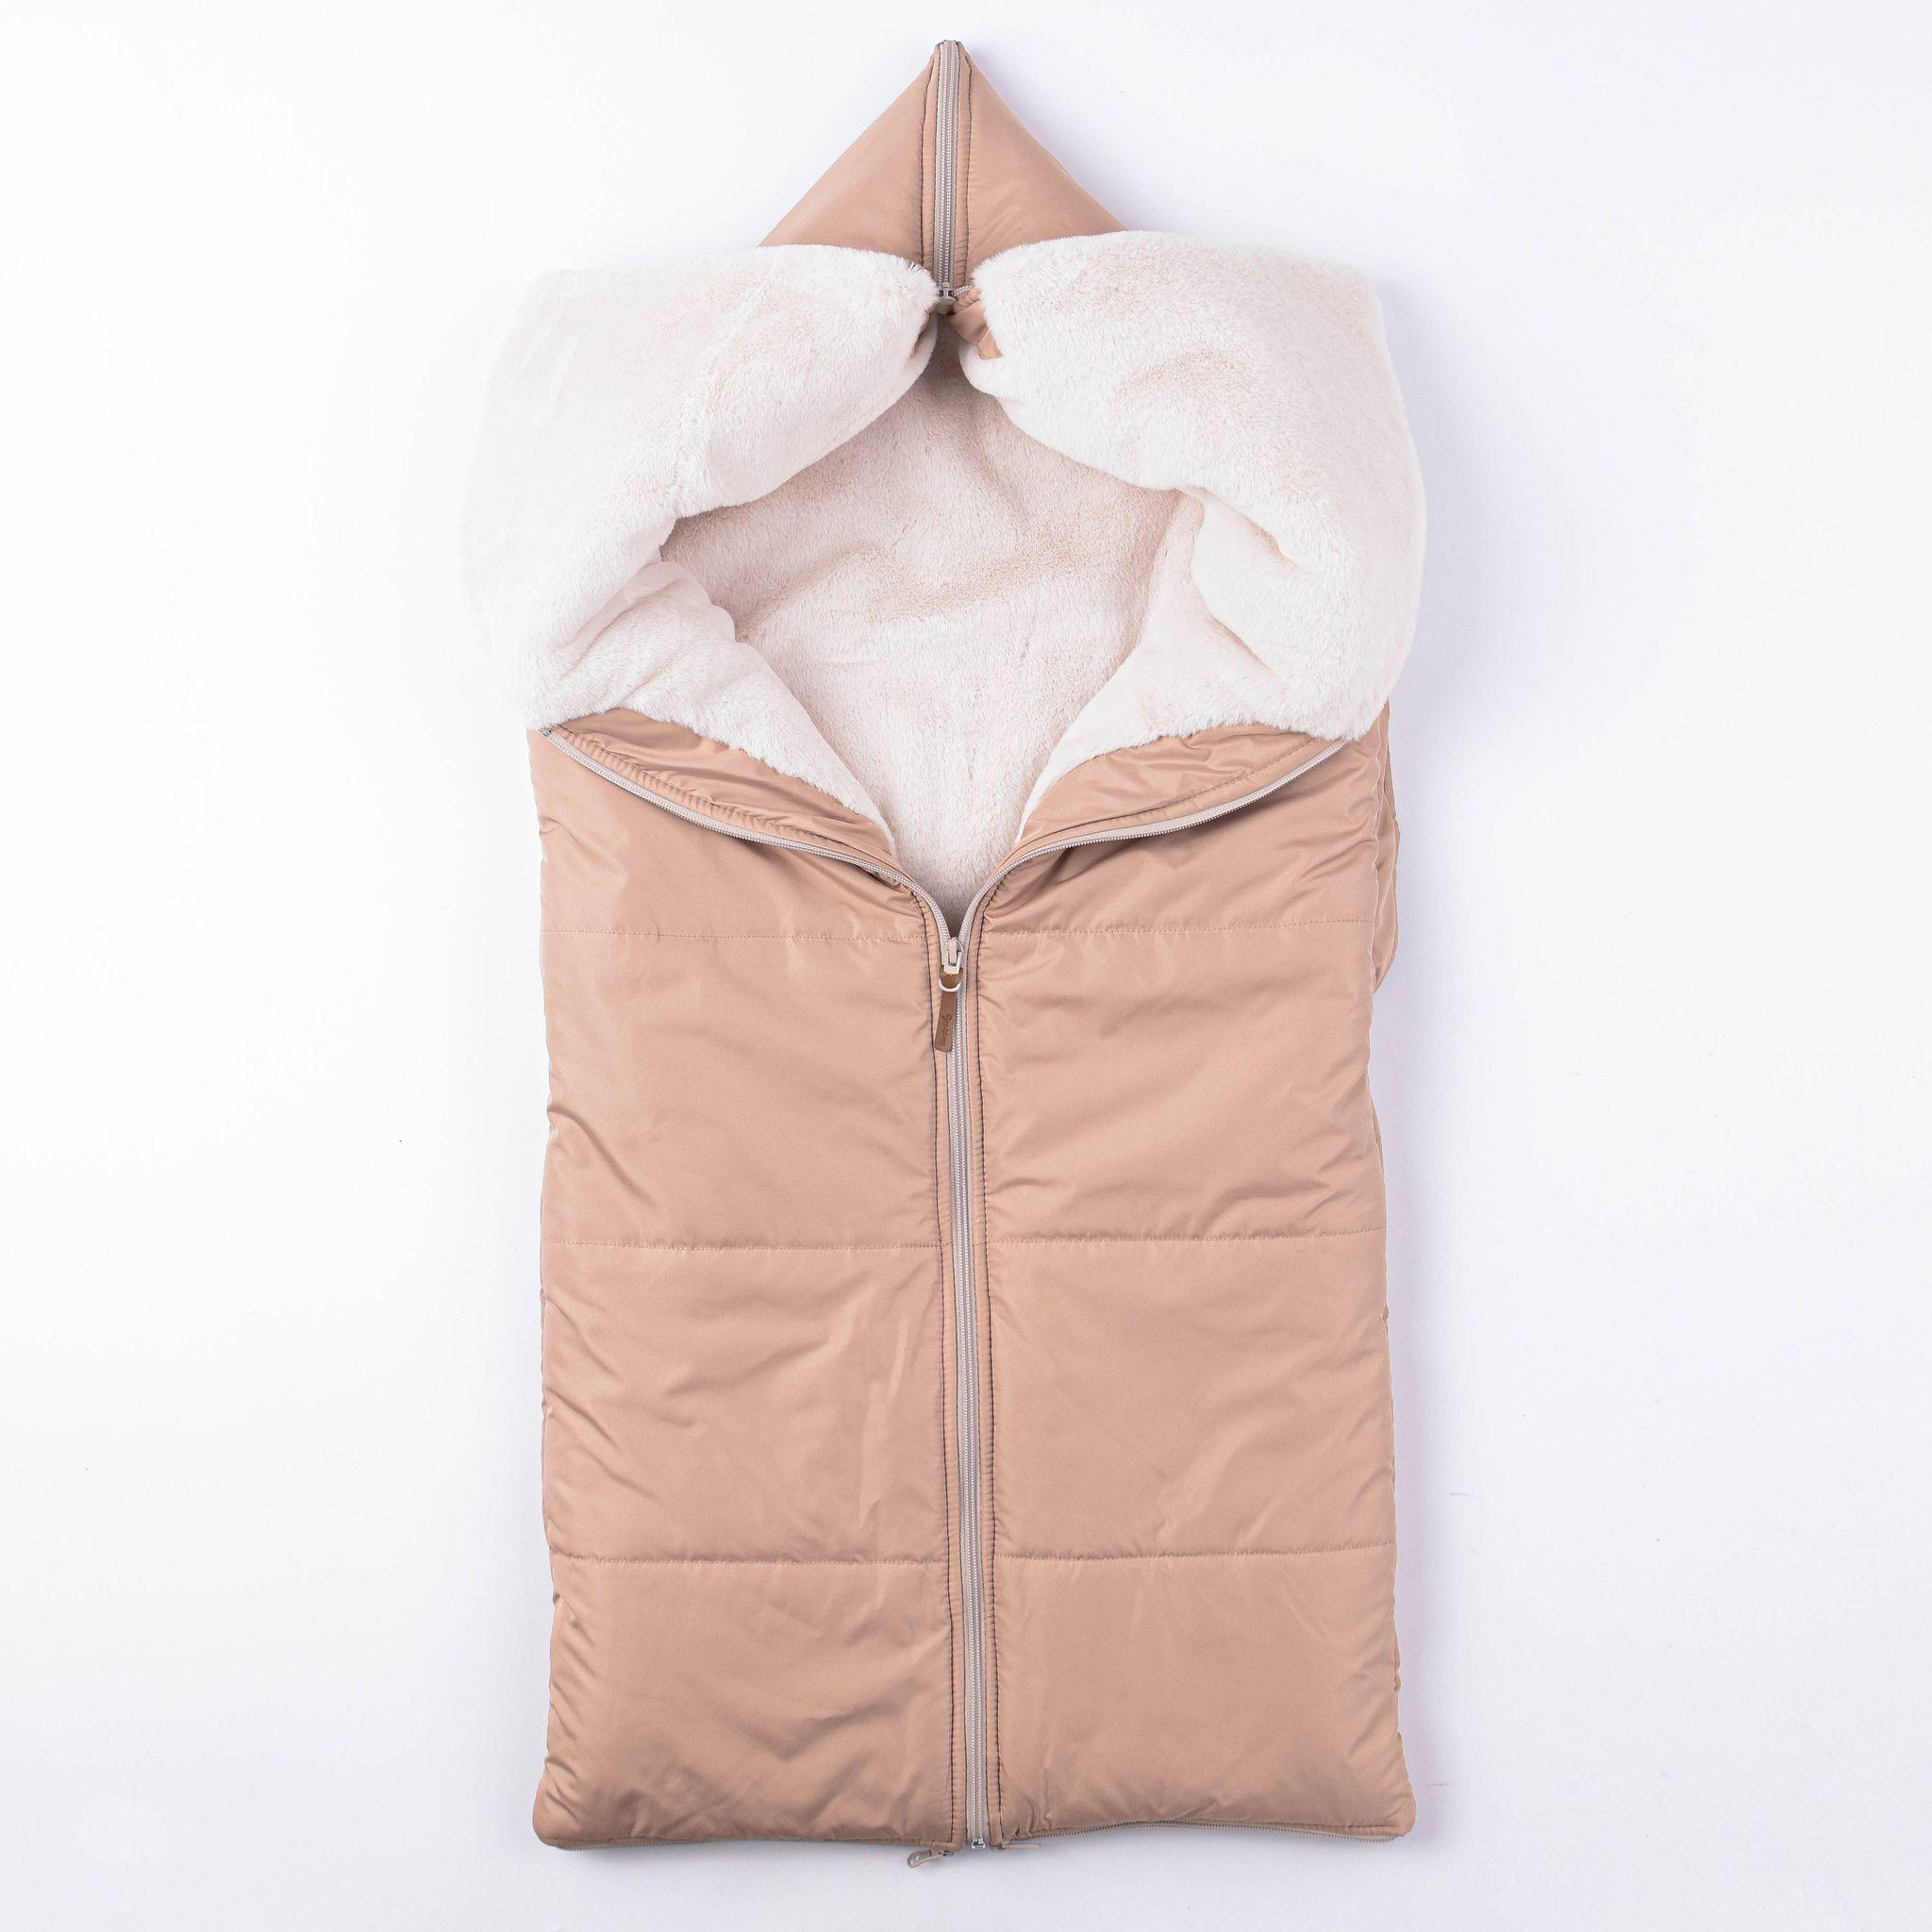 Конверт-одеяло на меху